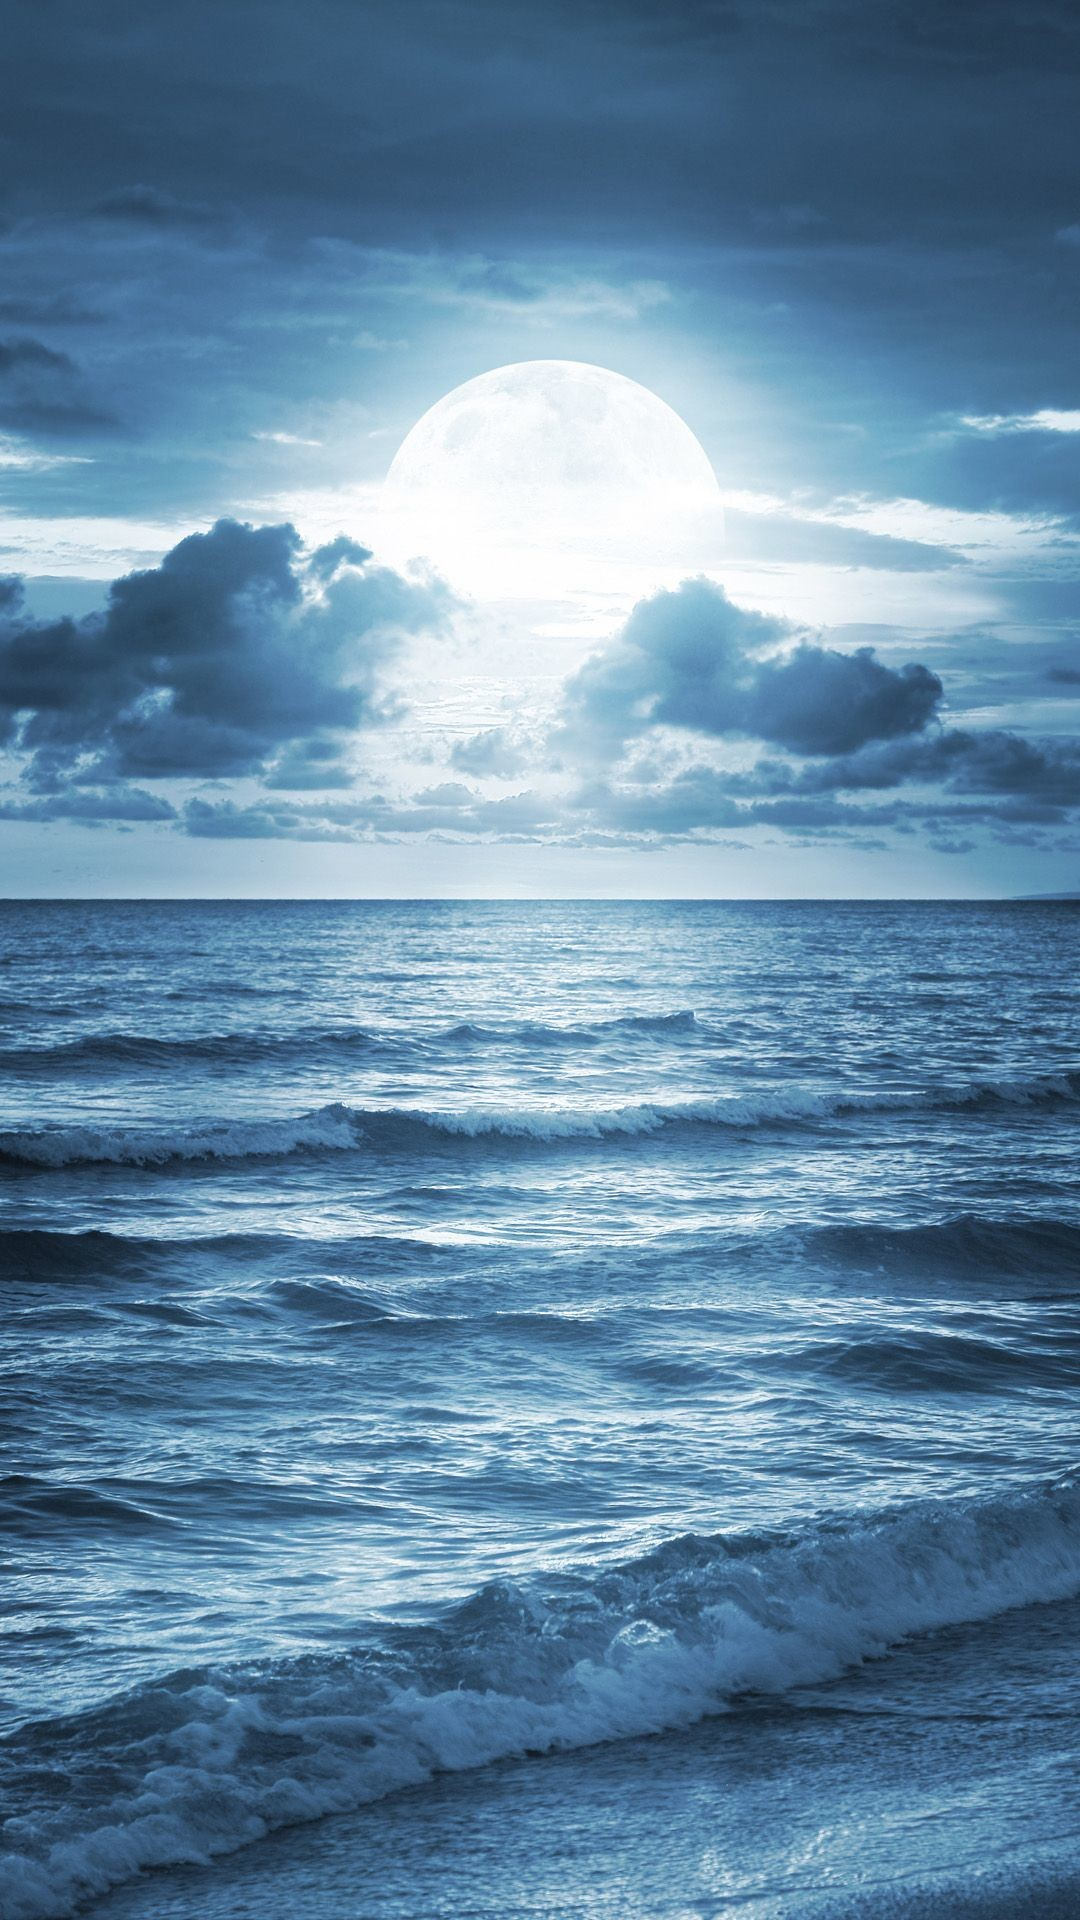 Res: 1080x1920, Blue Ocean Beach At Dusk iPhone 6 wallpaper